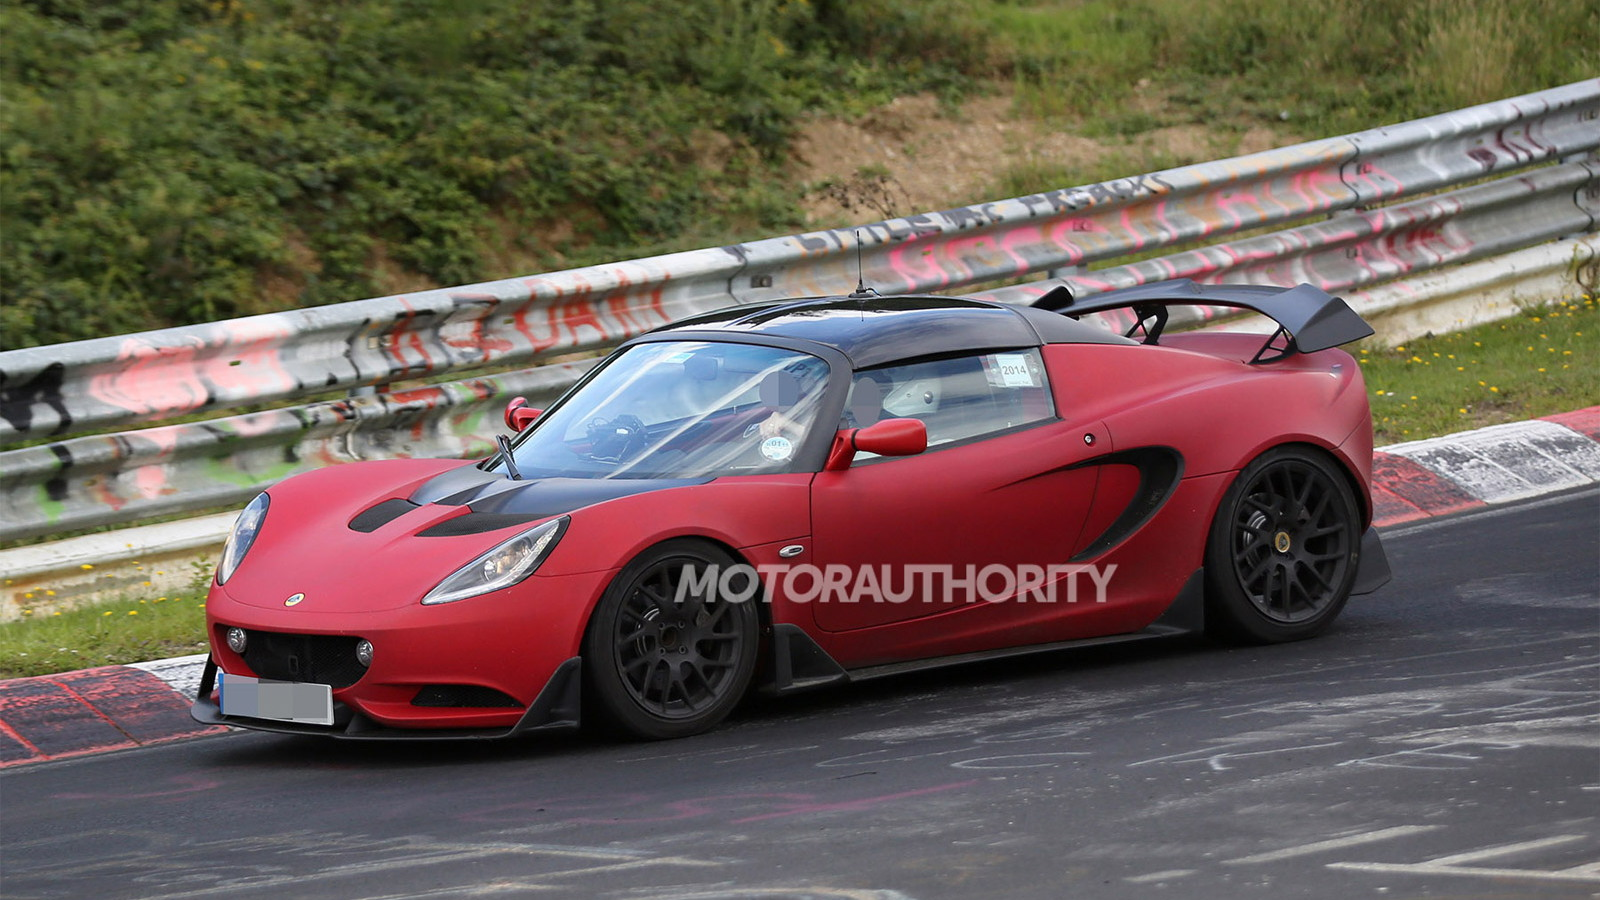 2015 Lotus Elise S Cup R road car spy shots